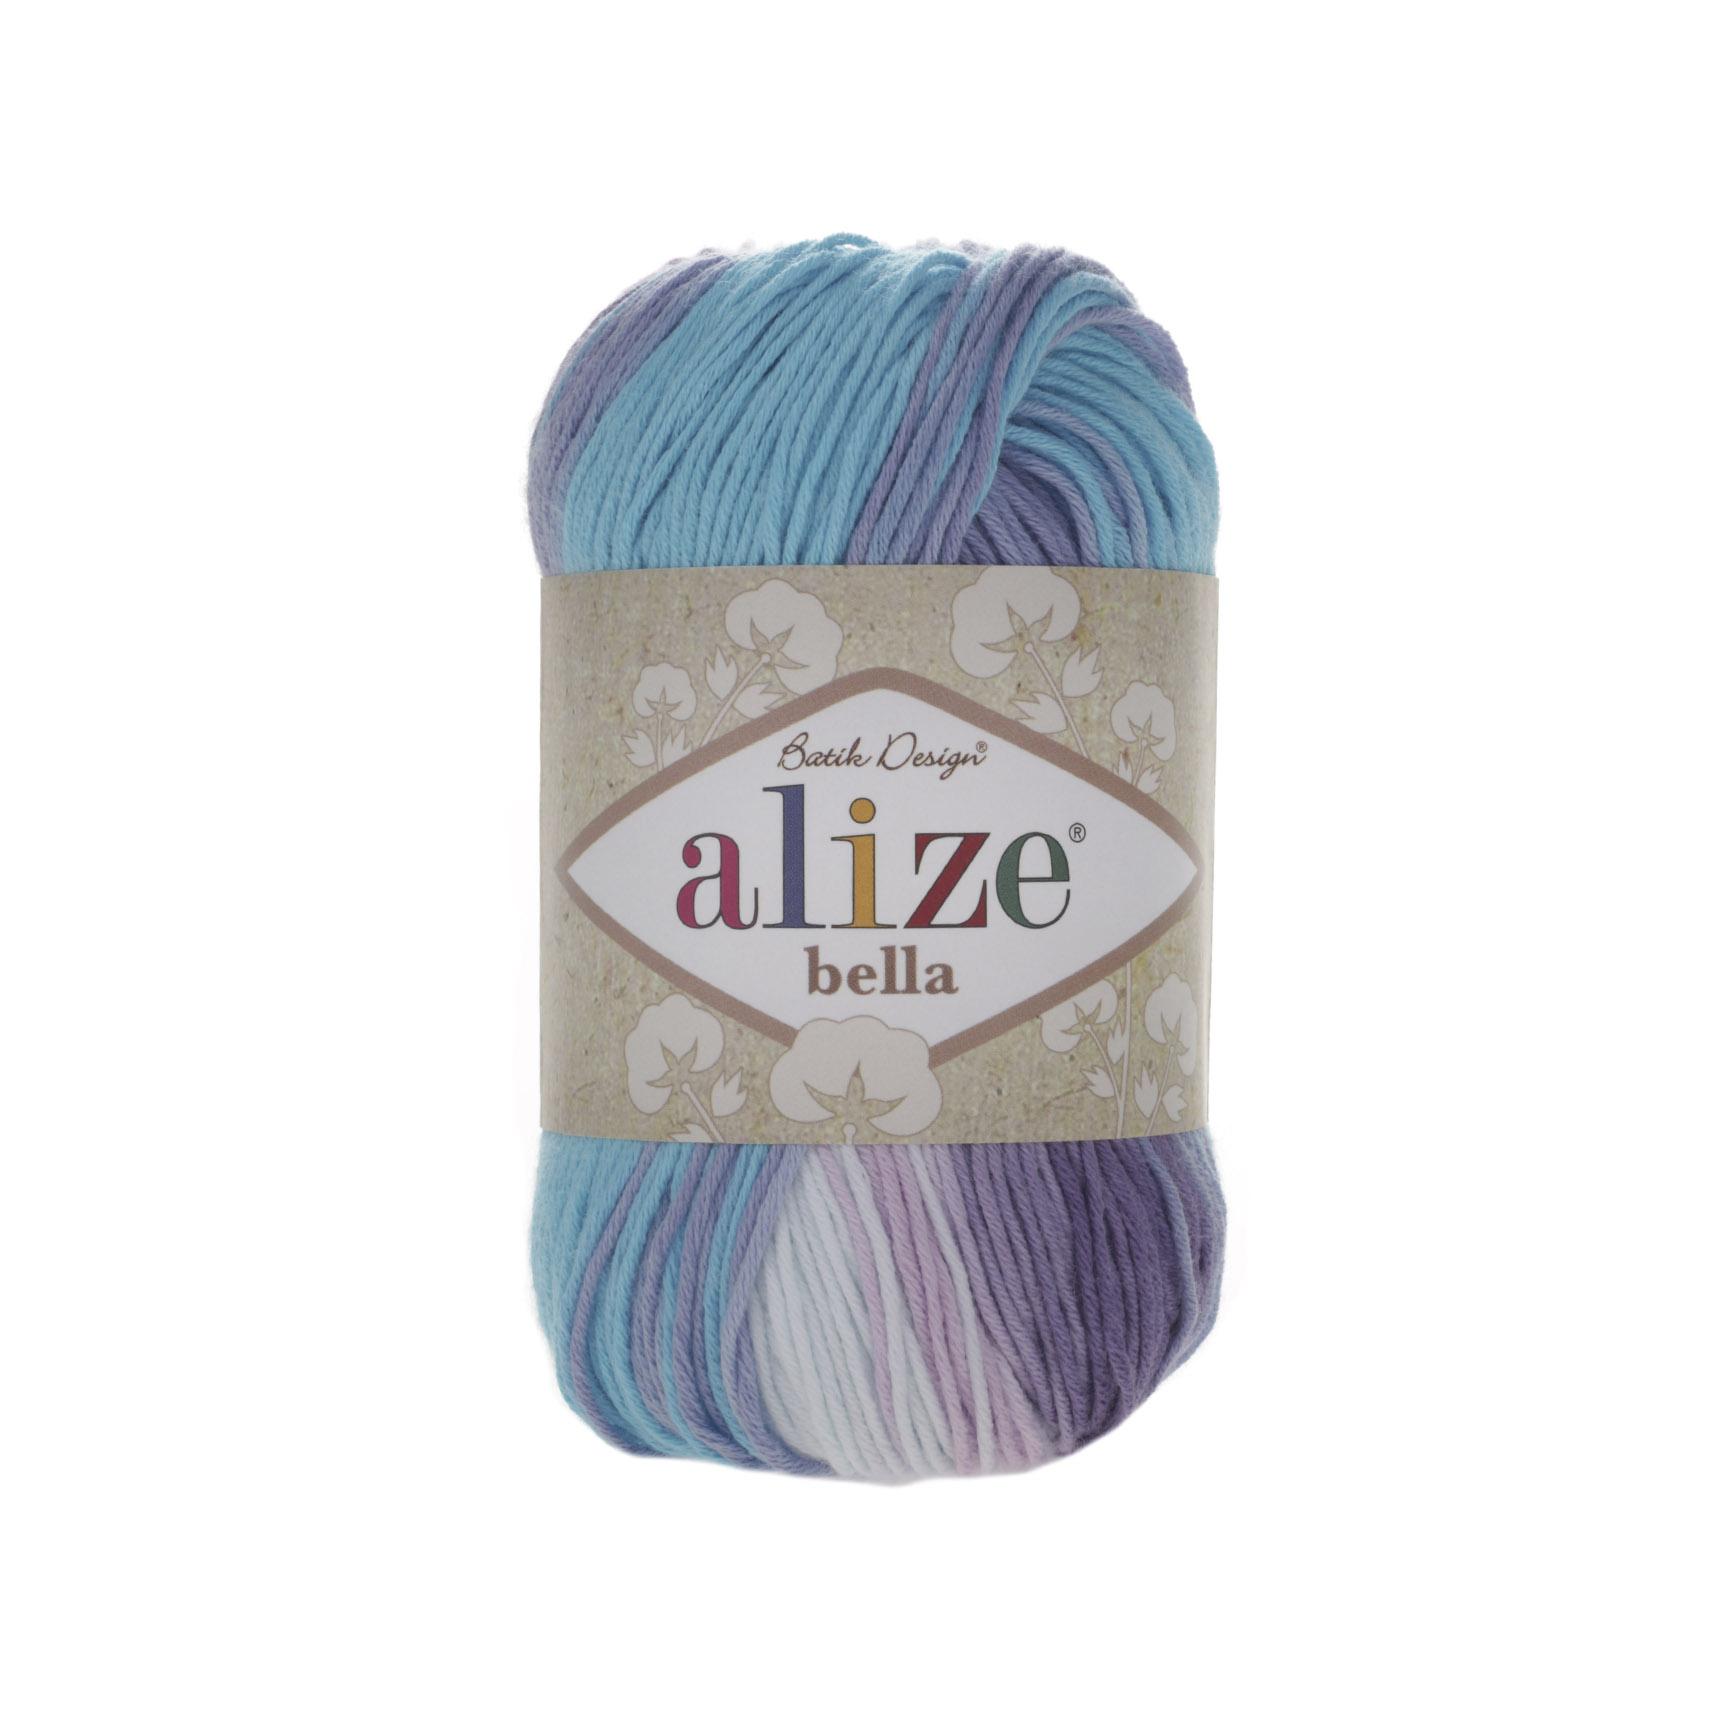 Alize Bella Batik Design COD 3677-0